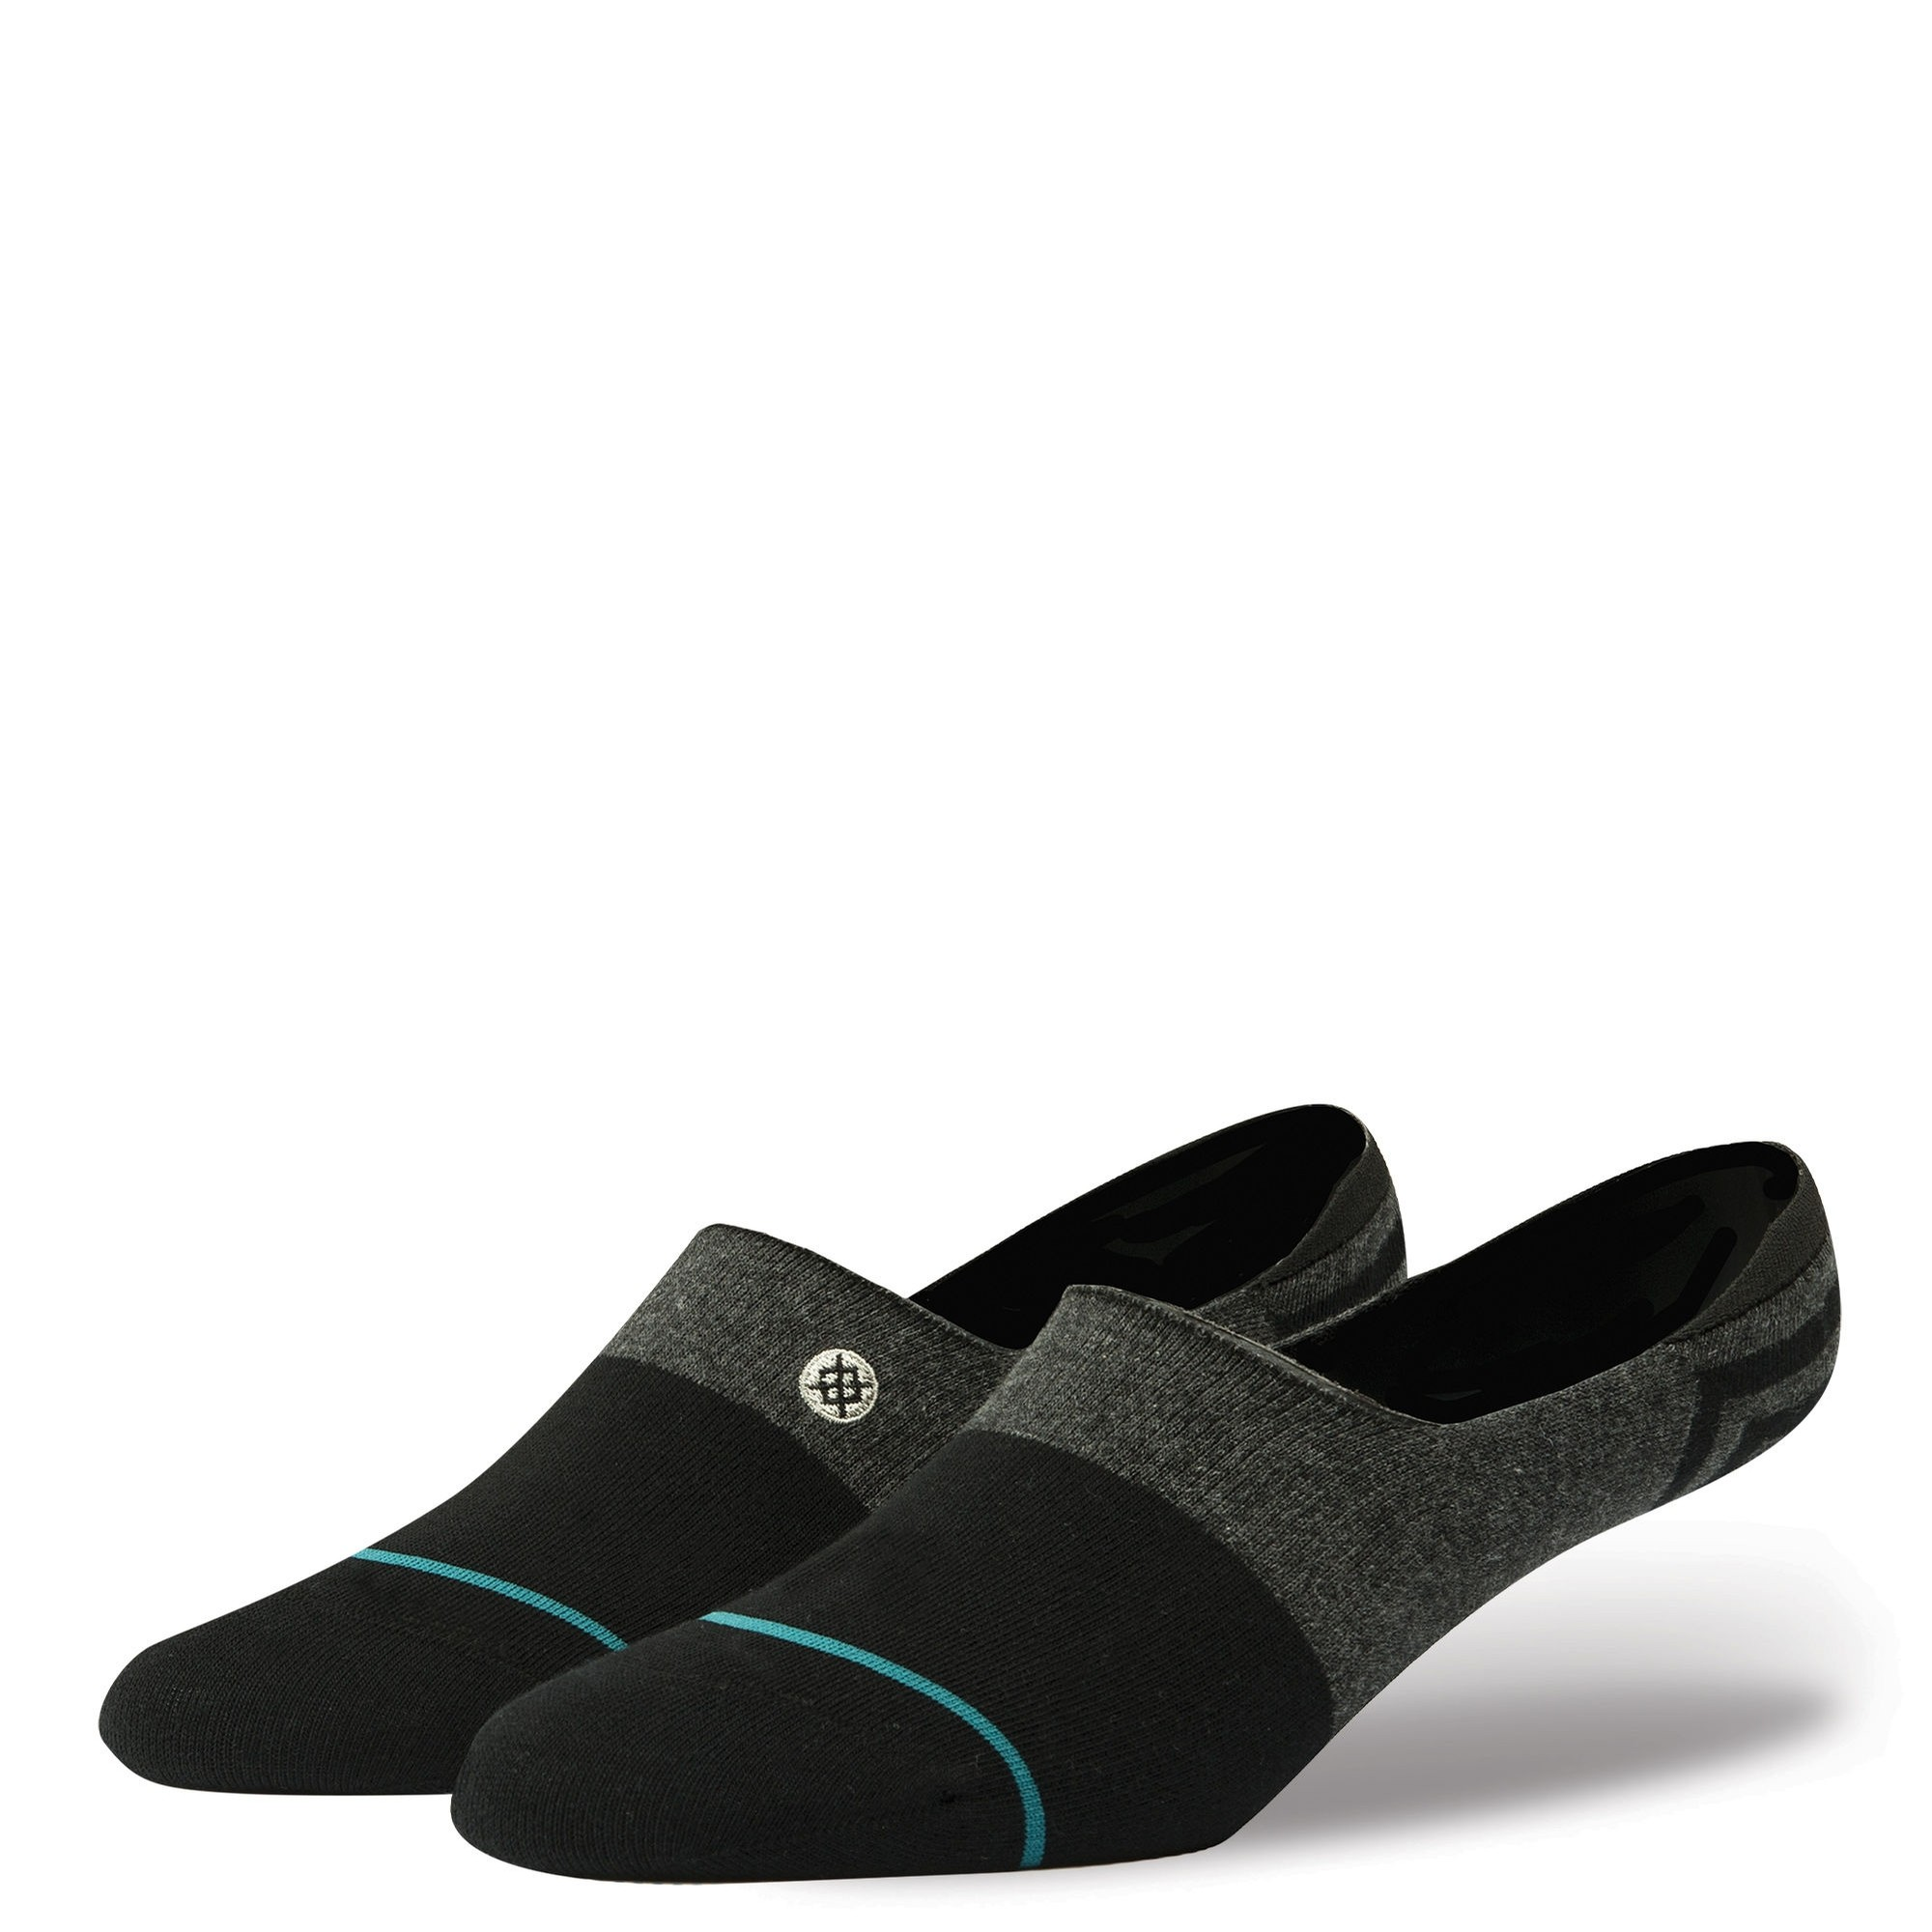 Gamut 2 sock